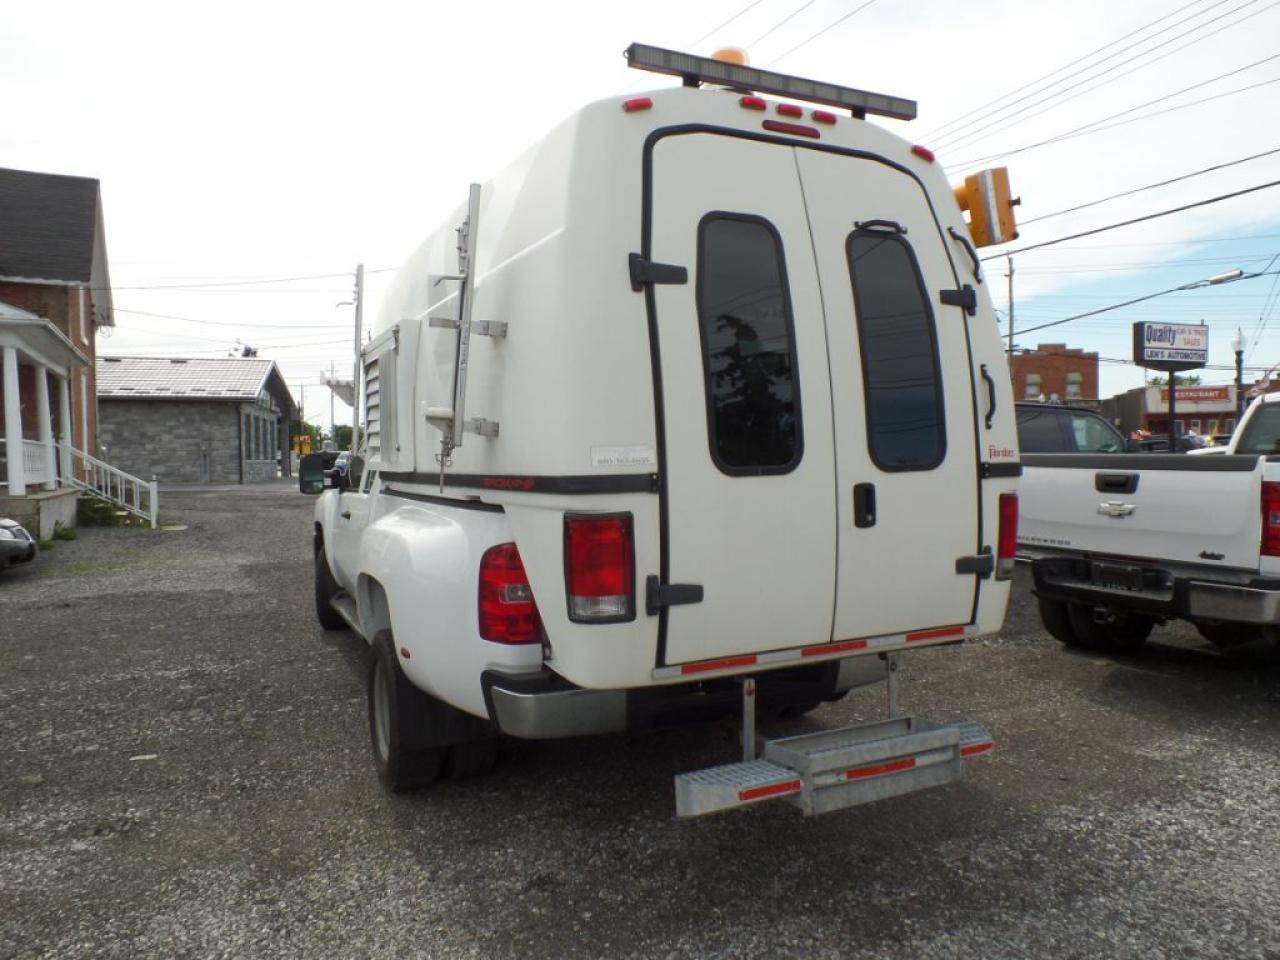 2009 Chevrolet Silverado 3500 HD Ext. Cab Dually w/Space Kap